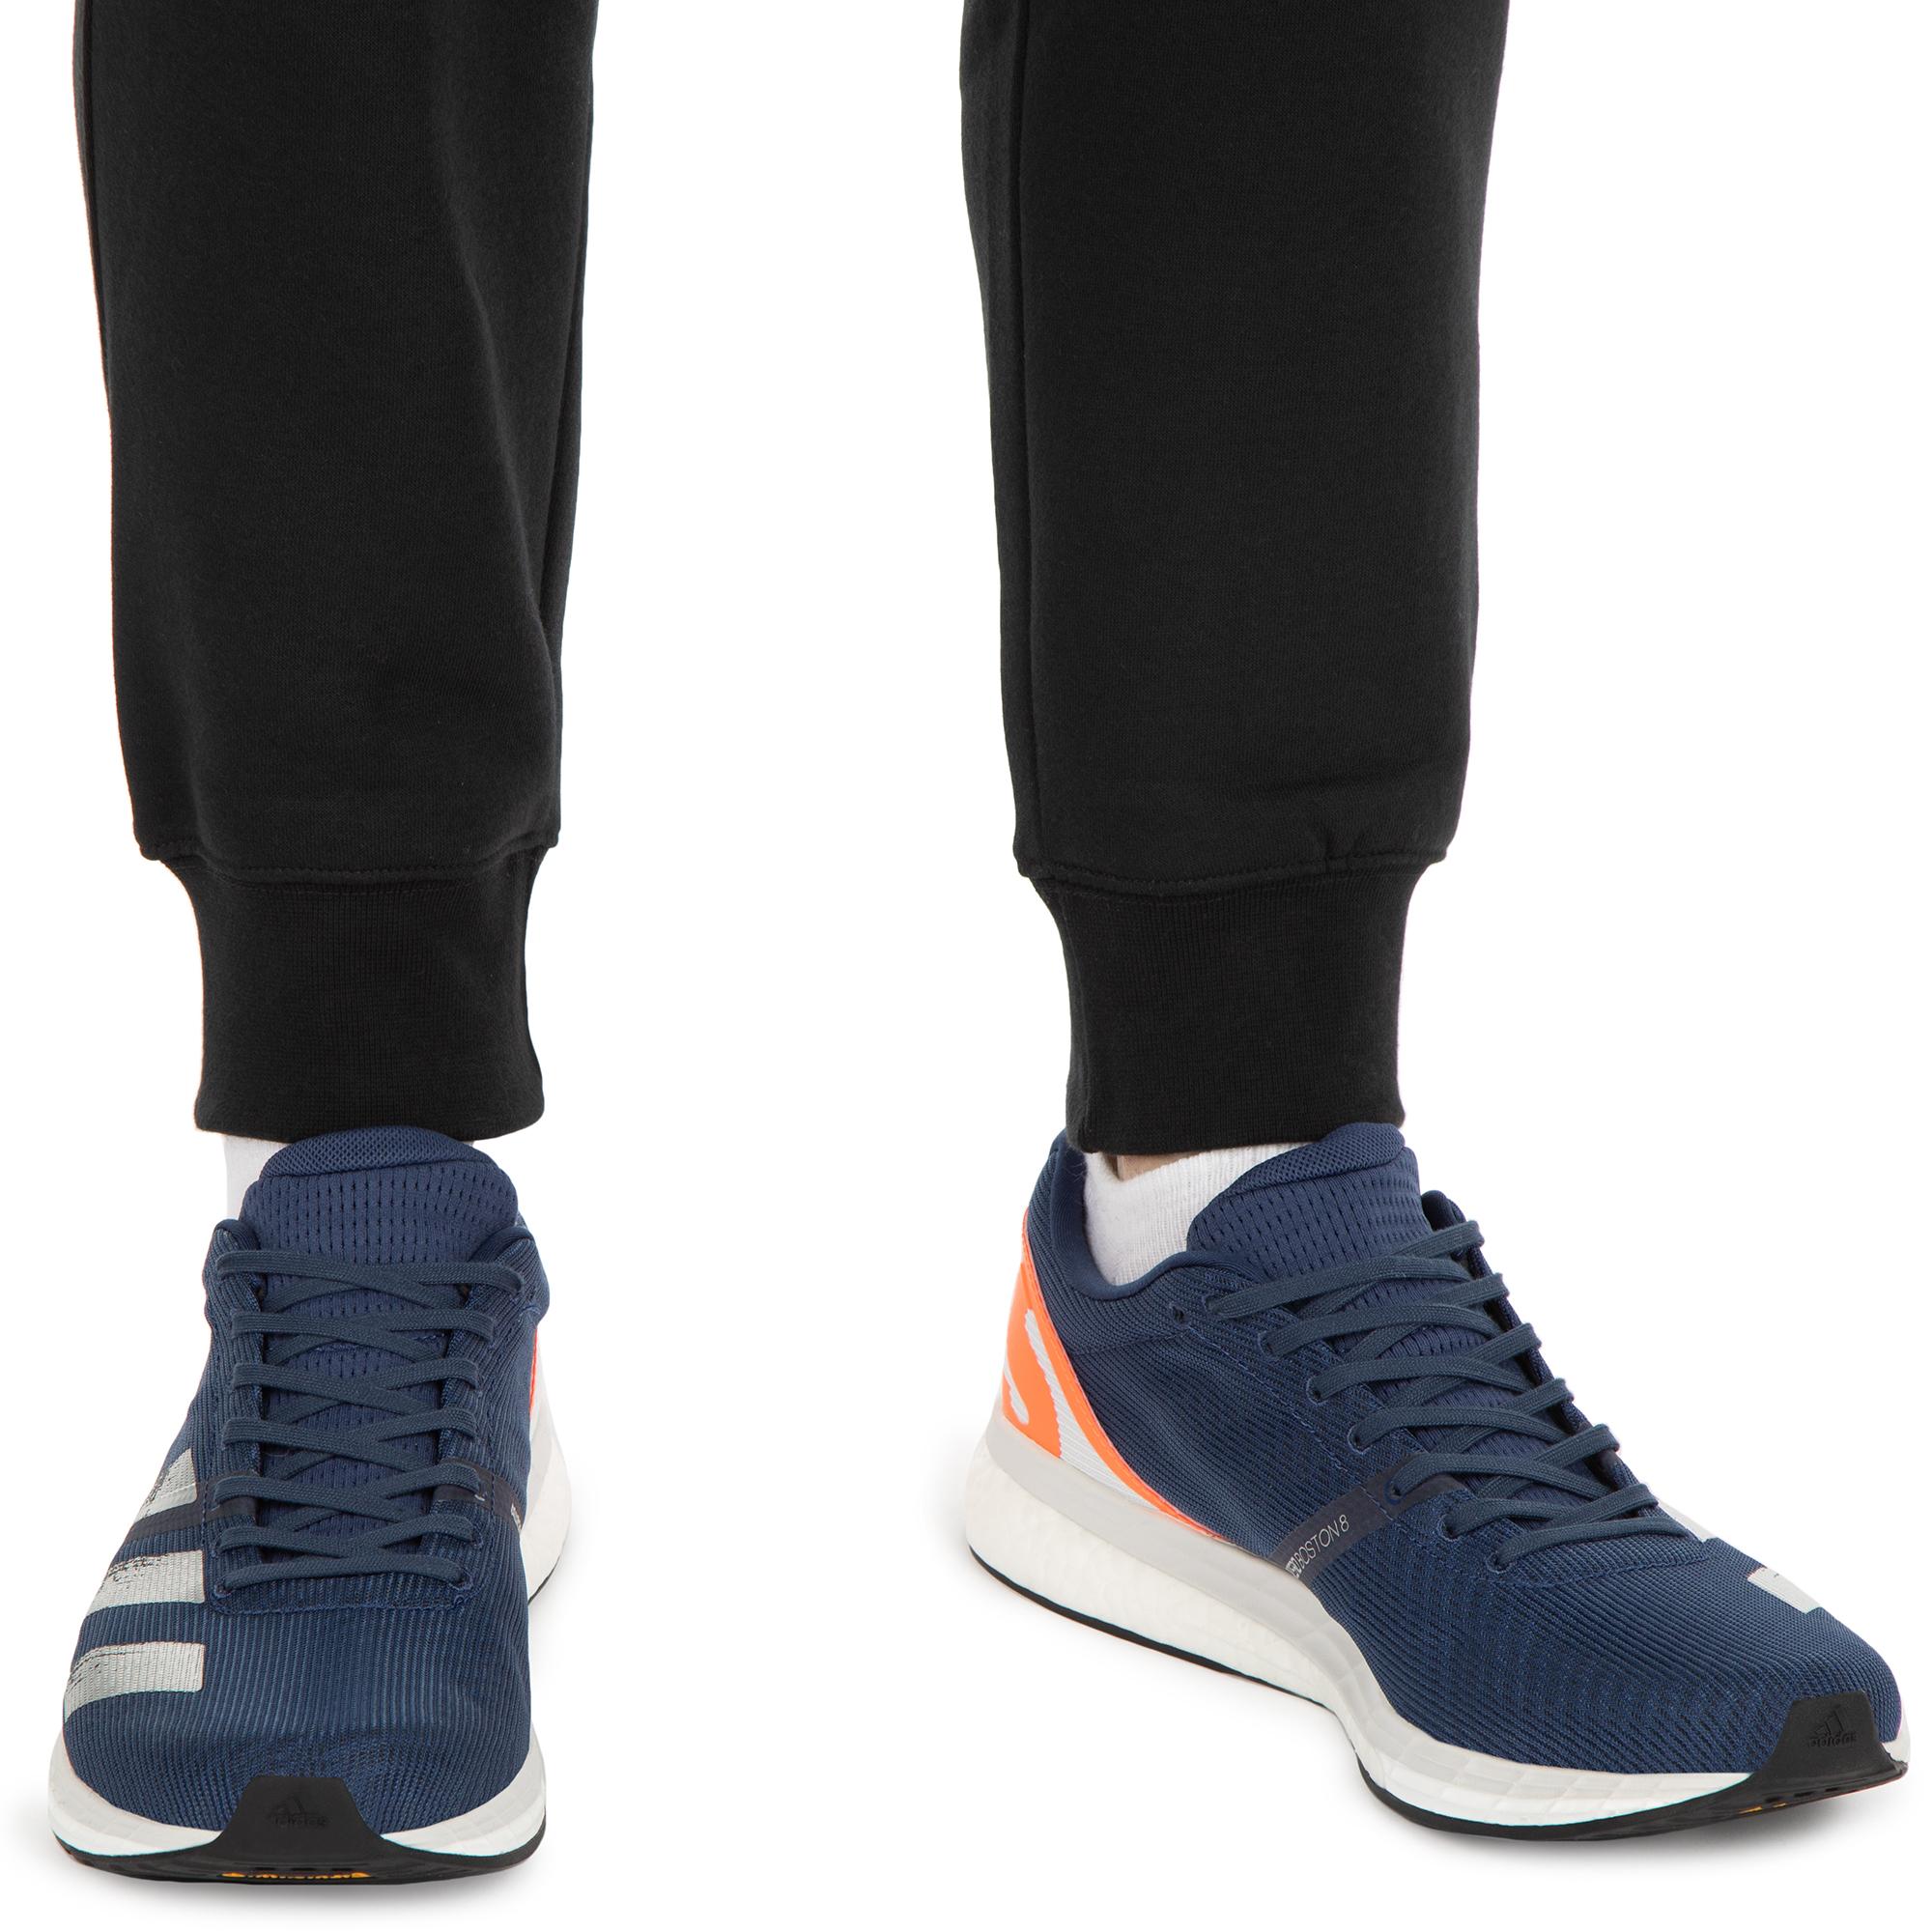 Adidas Кроссовки мужские Adizero Boston 8, размер 46